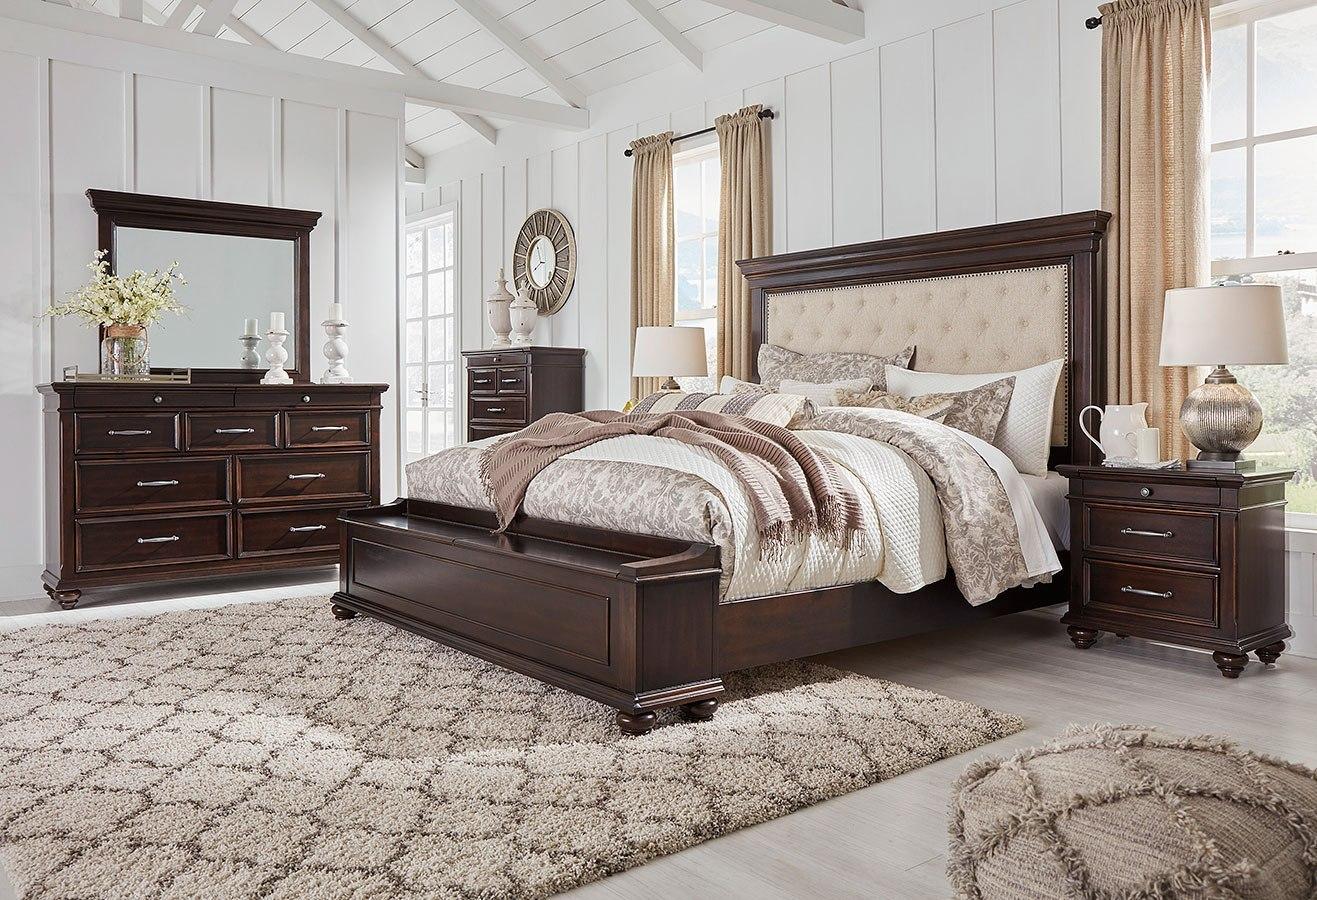 Brynhurst Upholstered Storage Bedroom Set